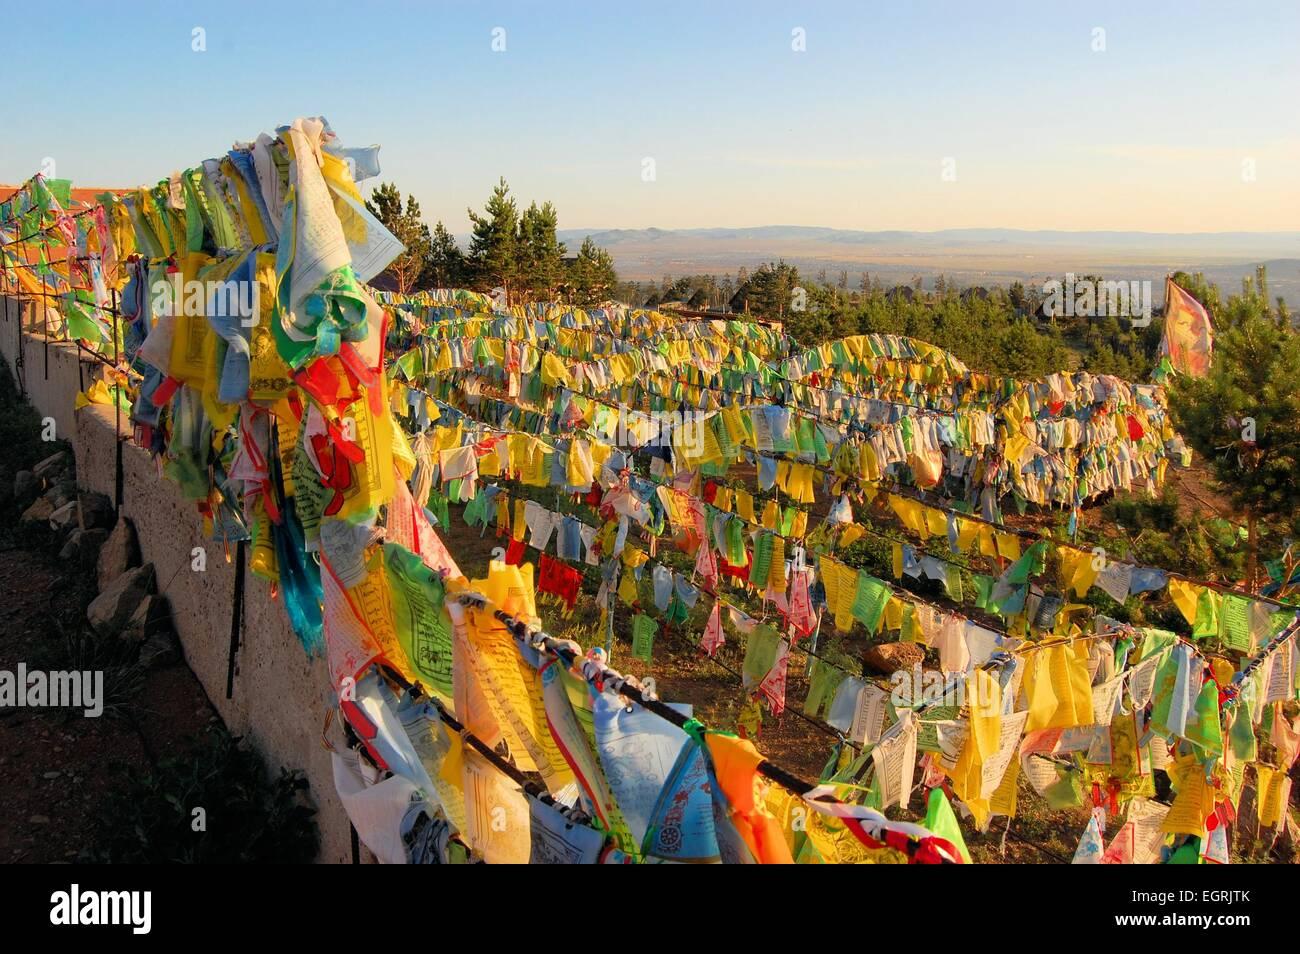 Prayer Flags at Ivolginsky Datsan temple, Ulan Ude, Russia - Stock Image